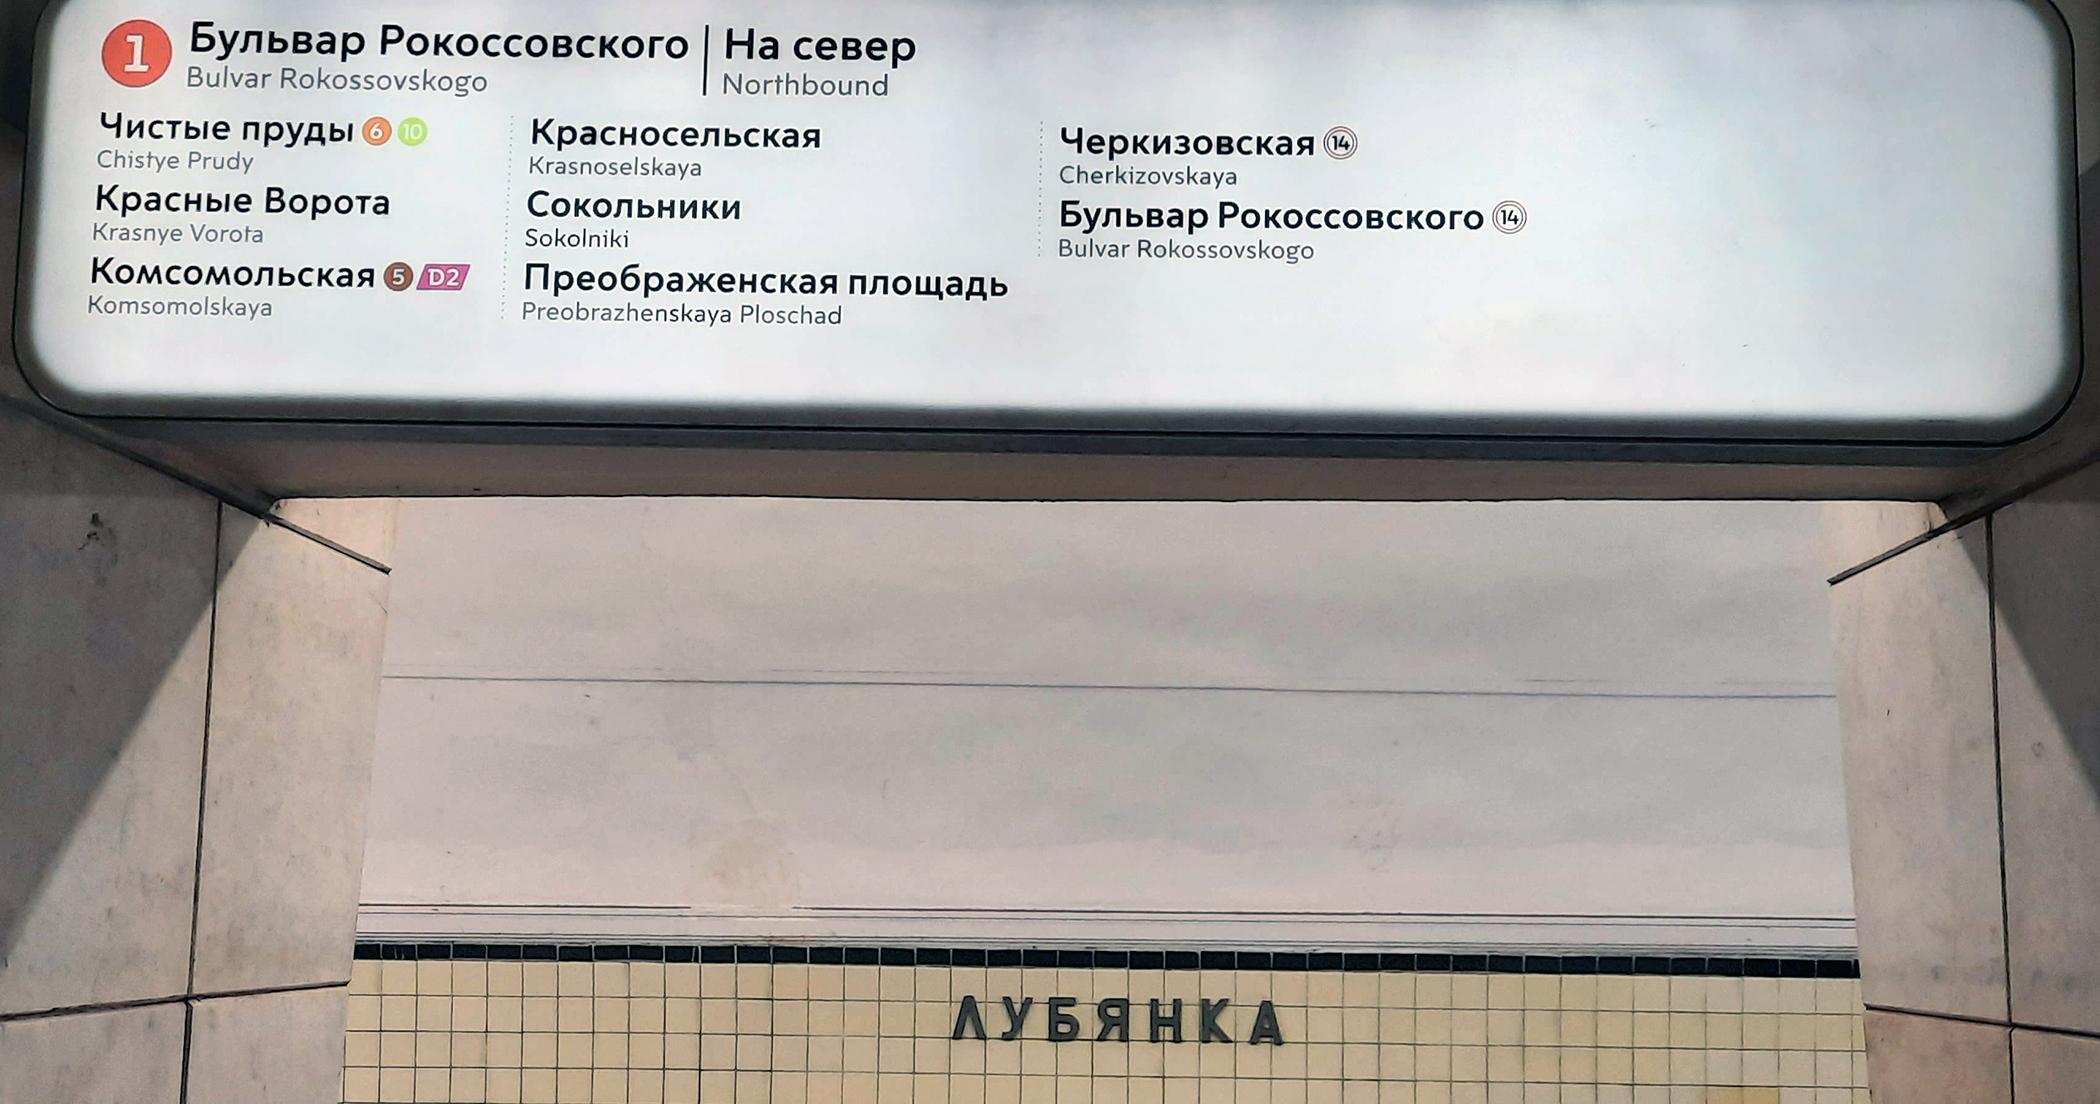 Carteles en ruso e inglés en el metro de Moscú